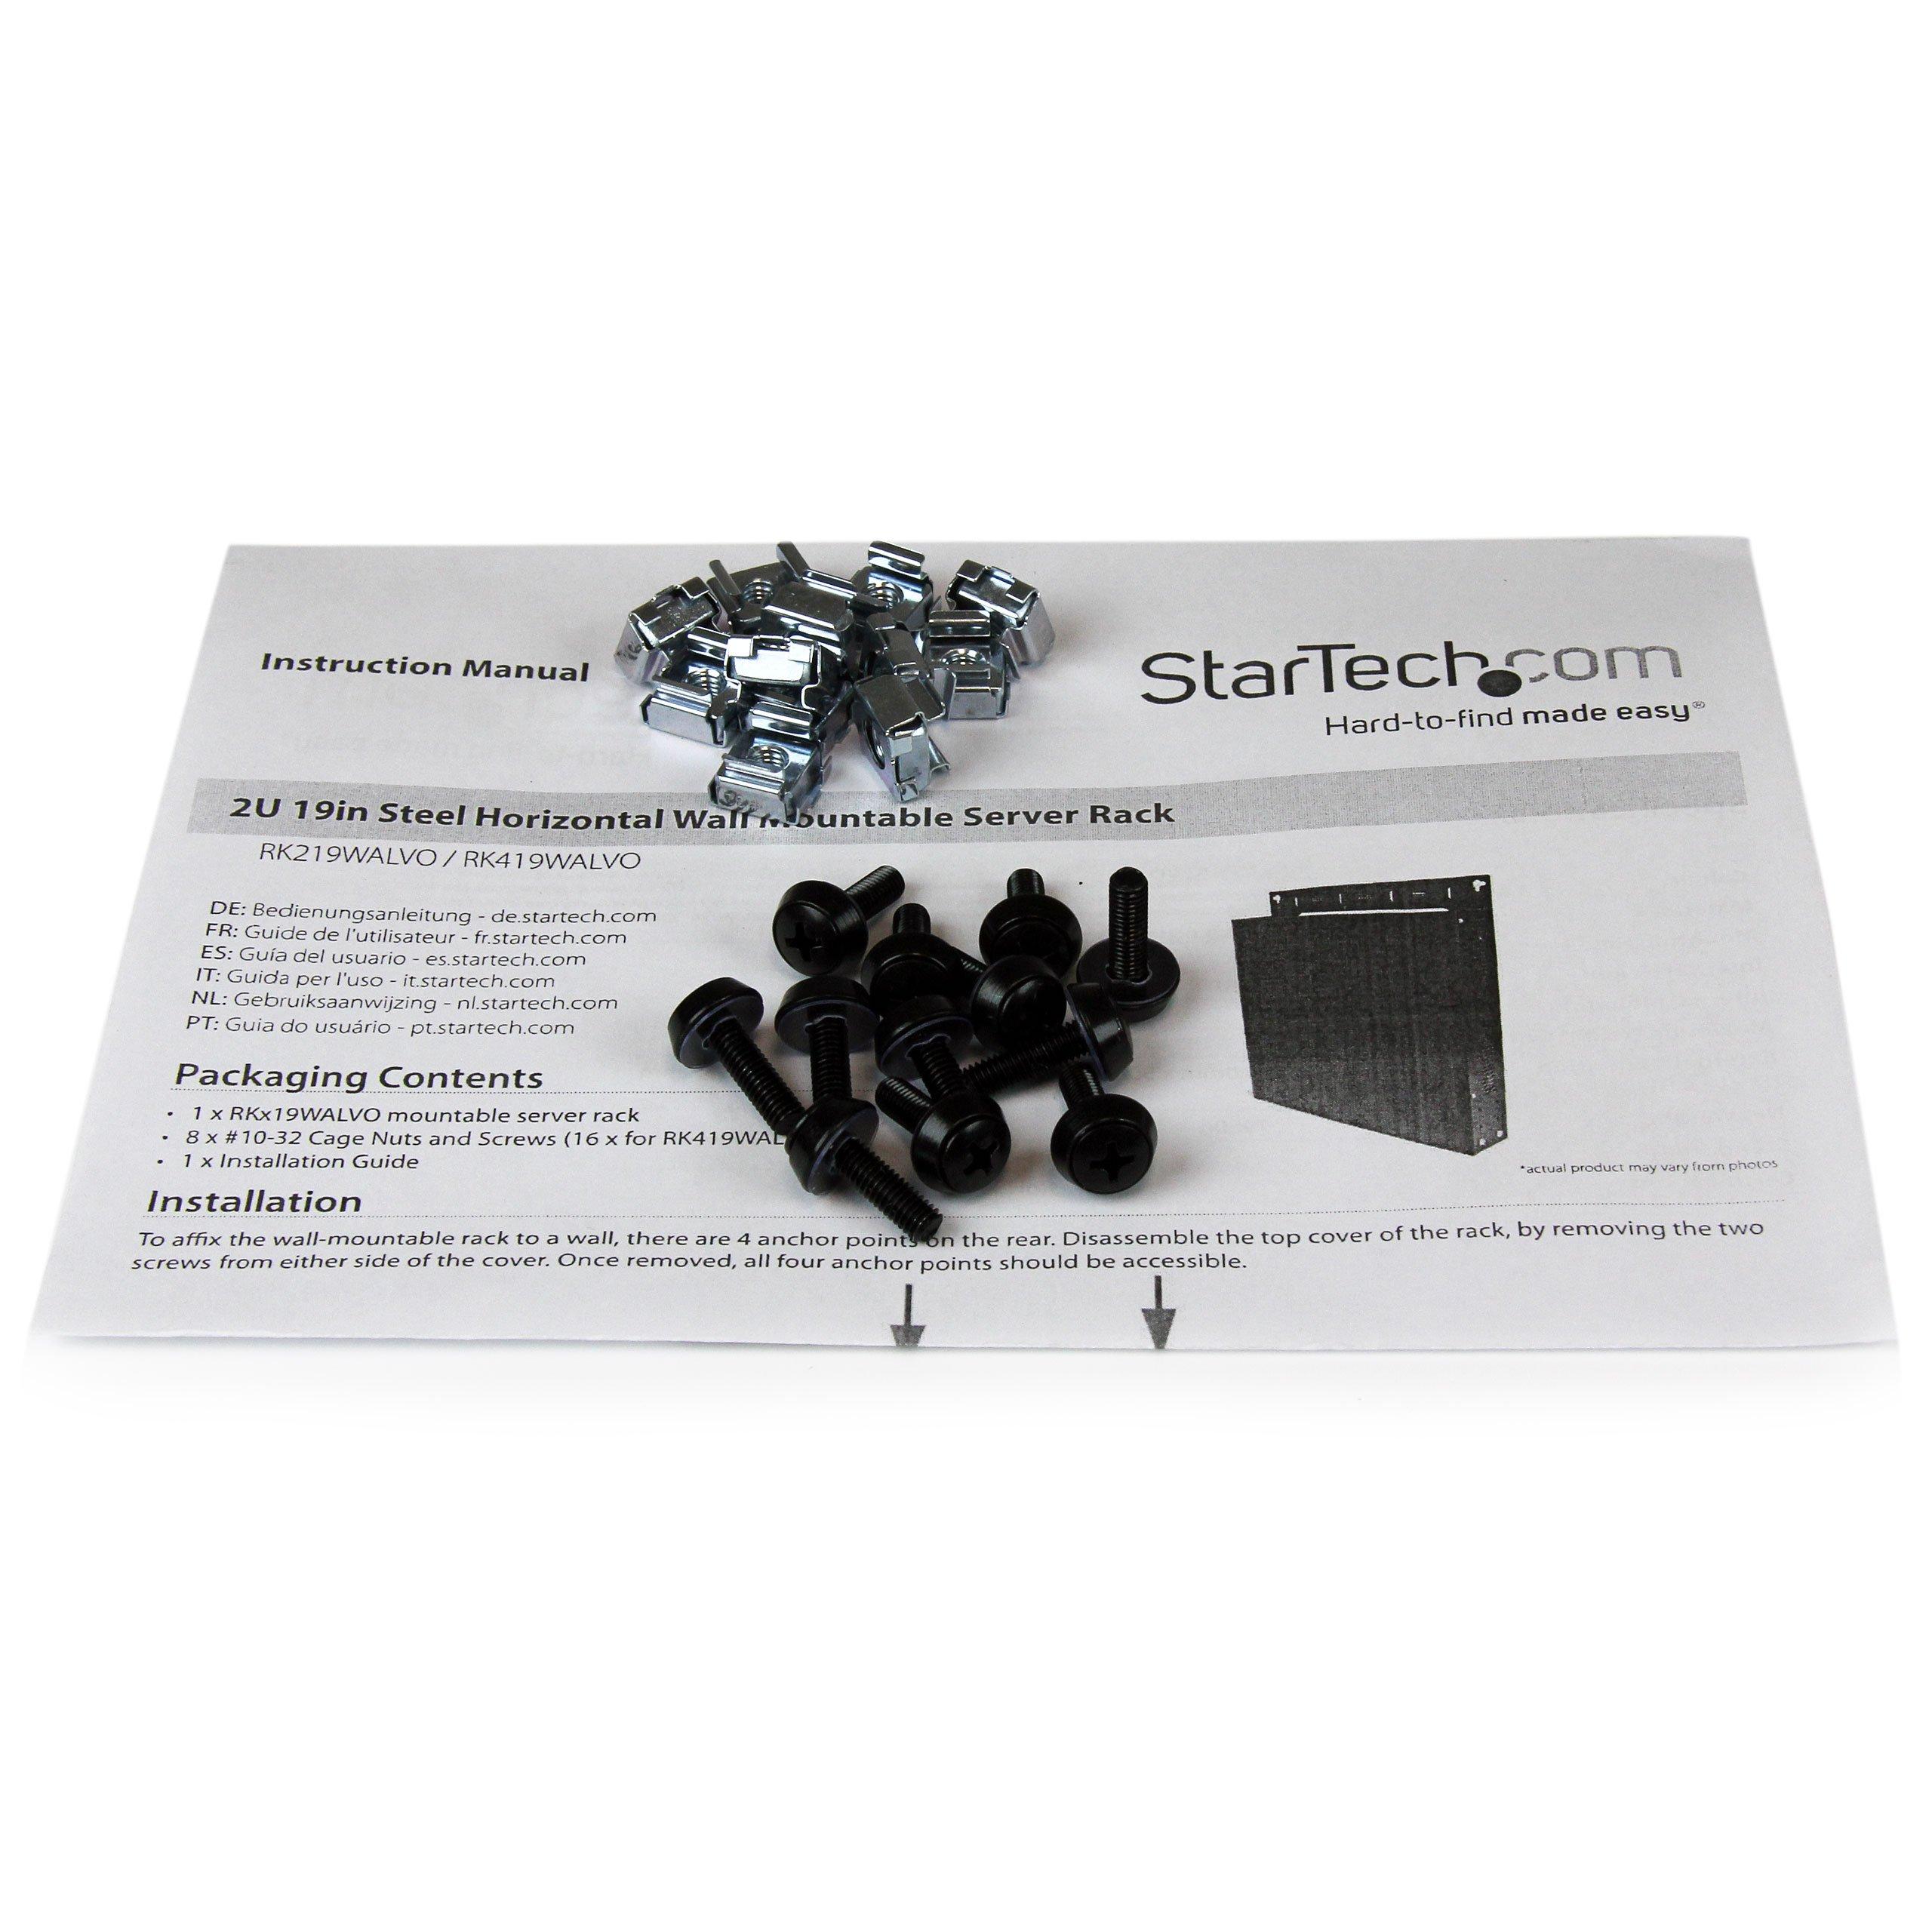 StarTech.com 4U 19-Inch Steel Horizontal Wall Mountable Server Rack RK419WALVO (Black) by StarTech (Image #7)